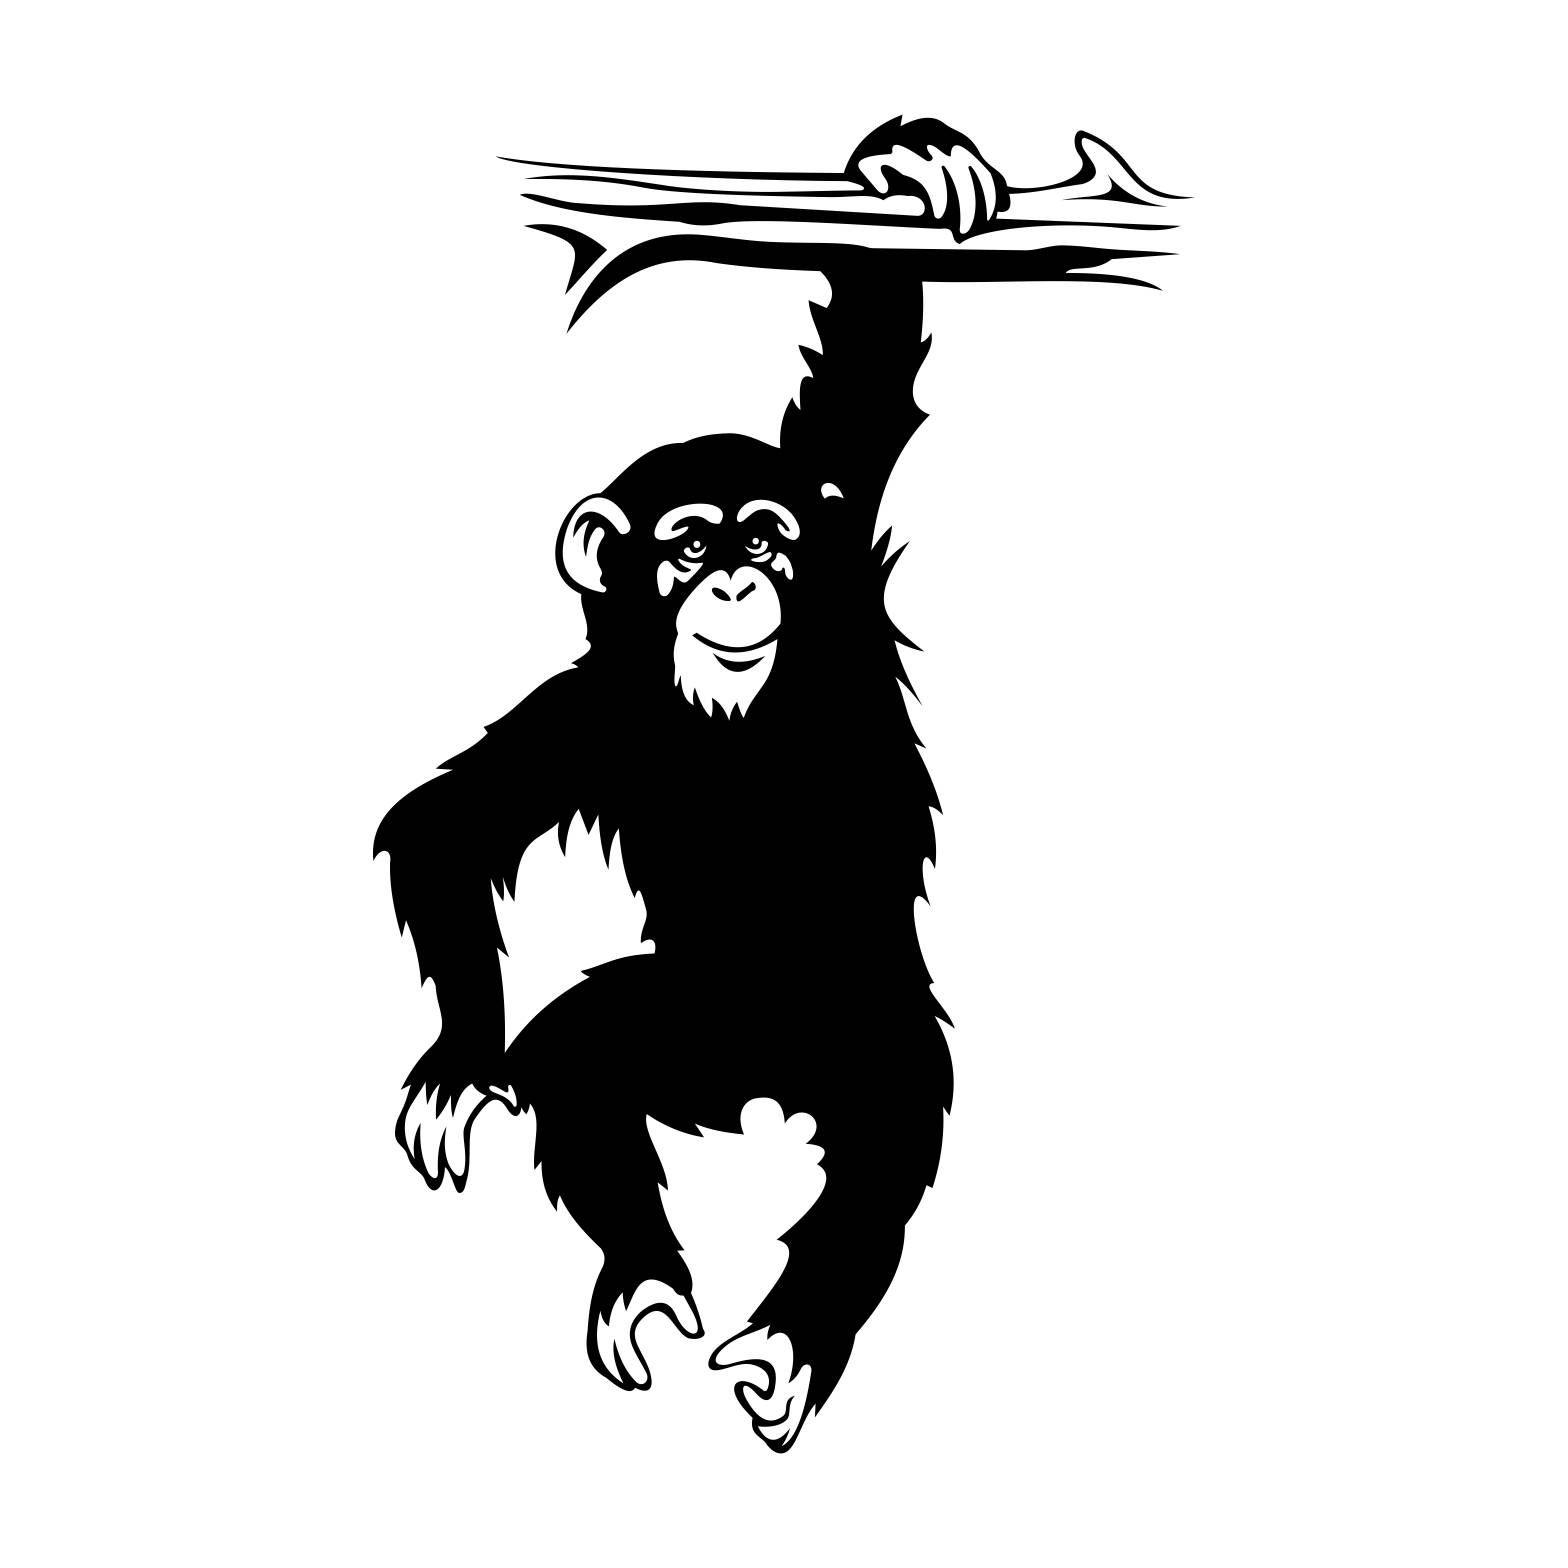 Monkey Chimpanzee Bough Graphics Svg Dxf Eps Cdr Ai